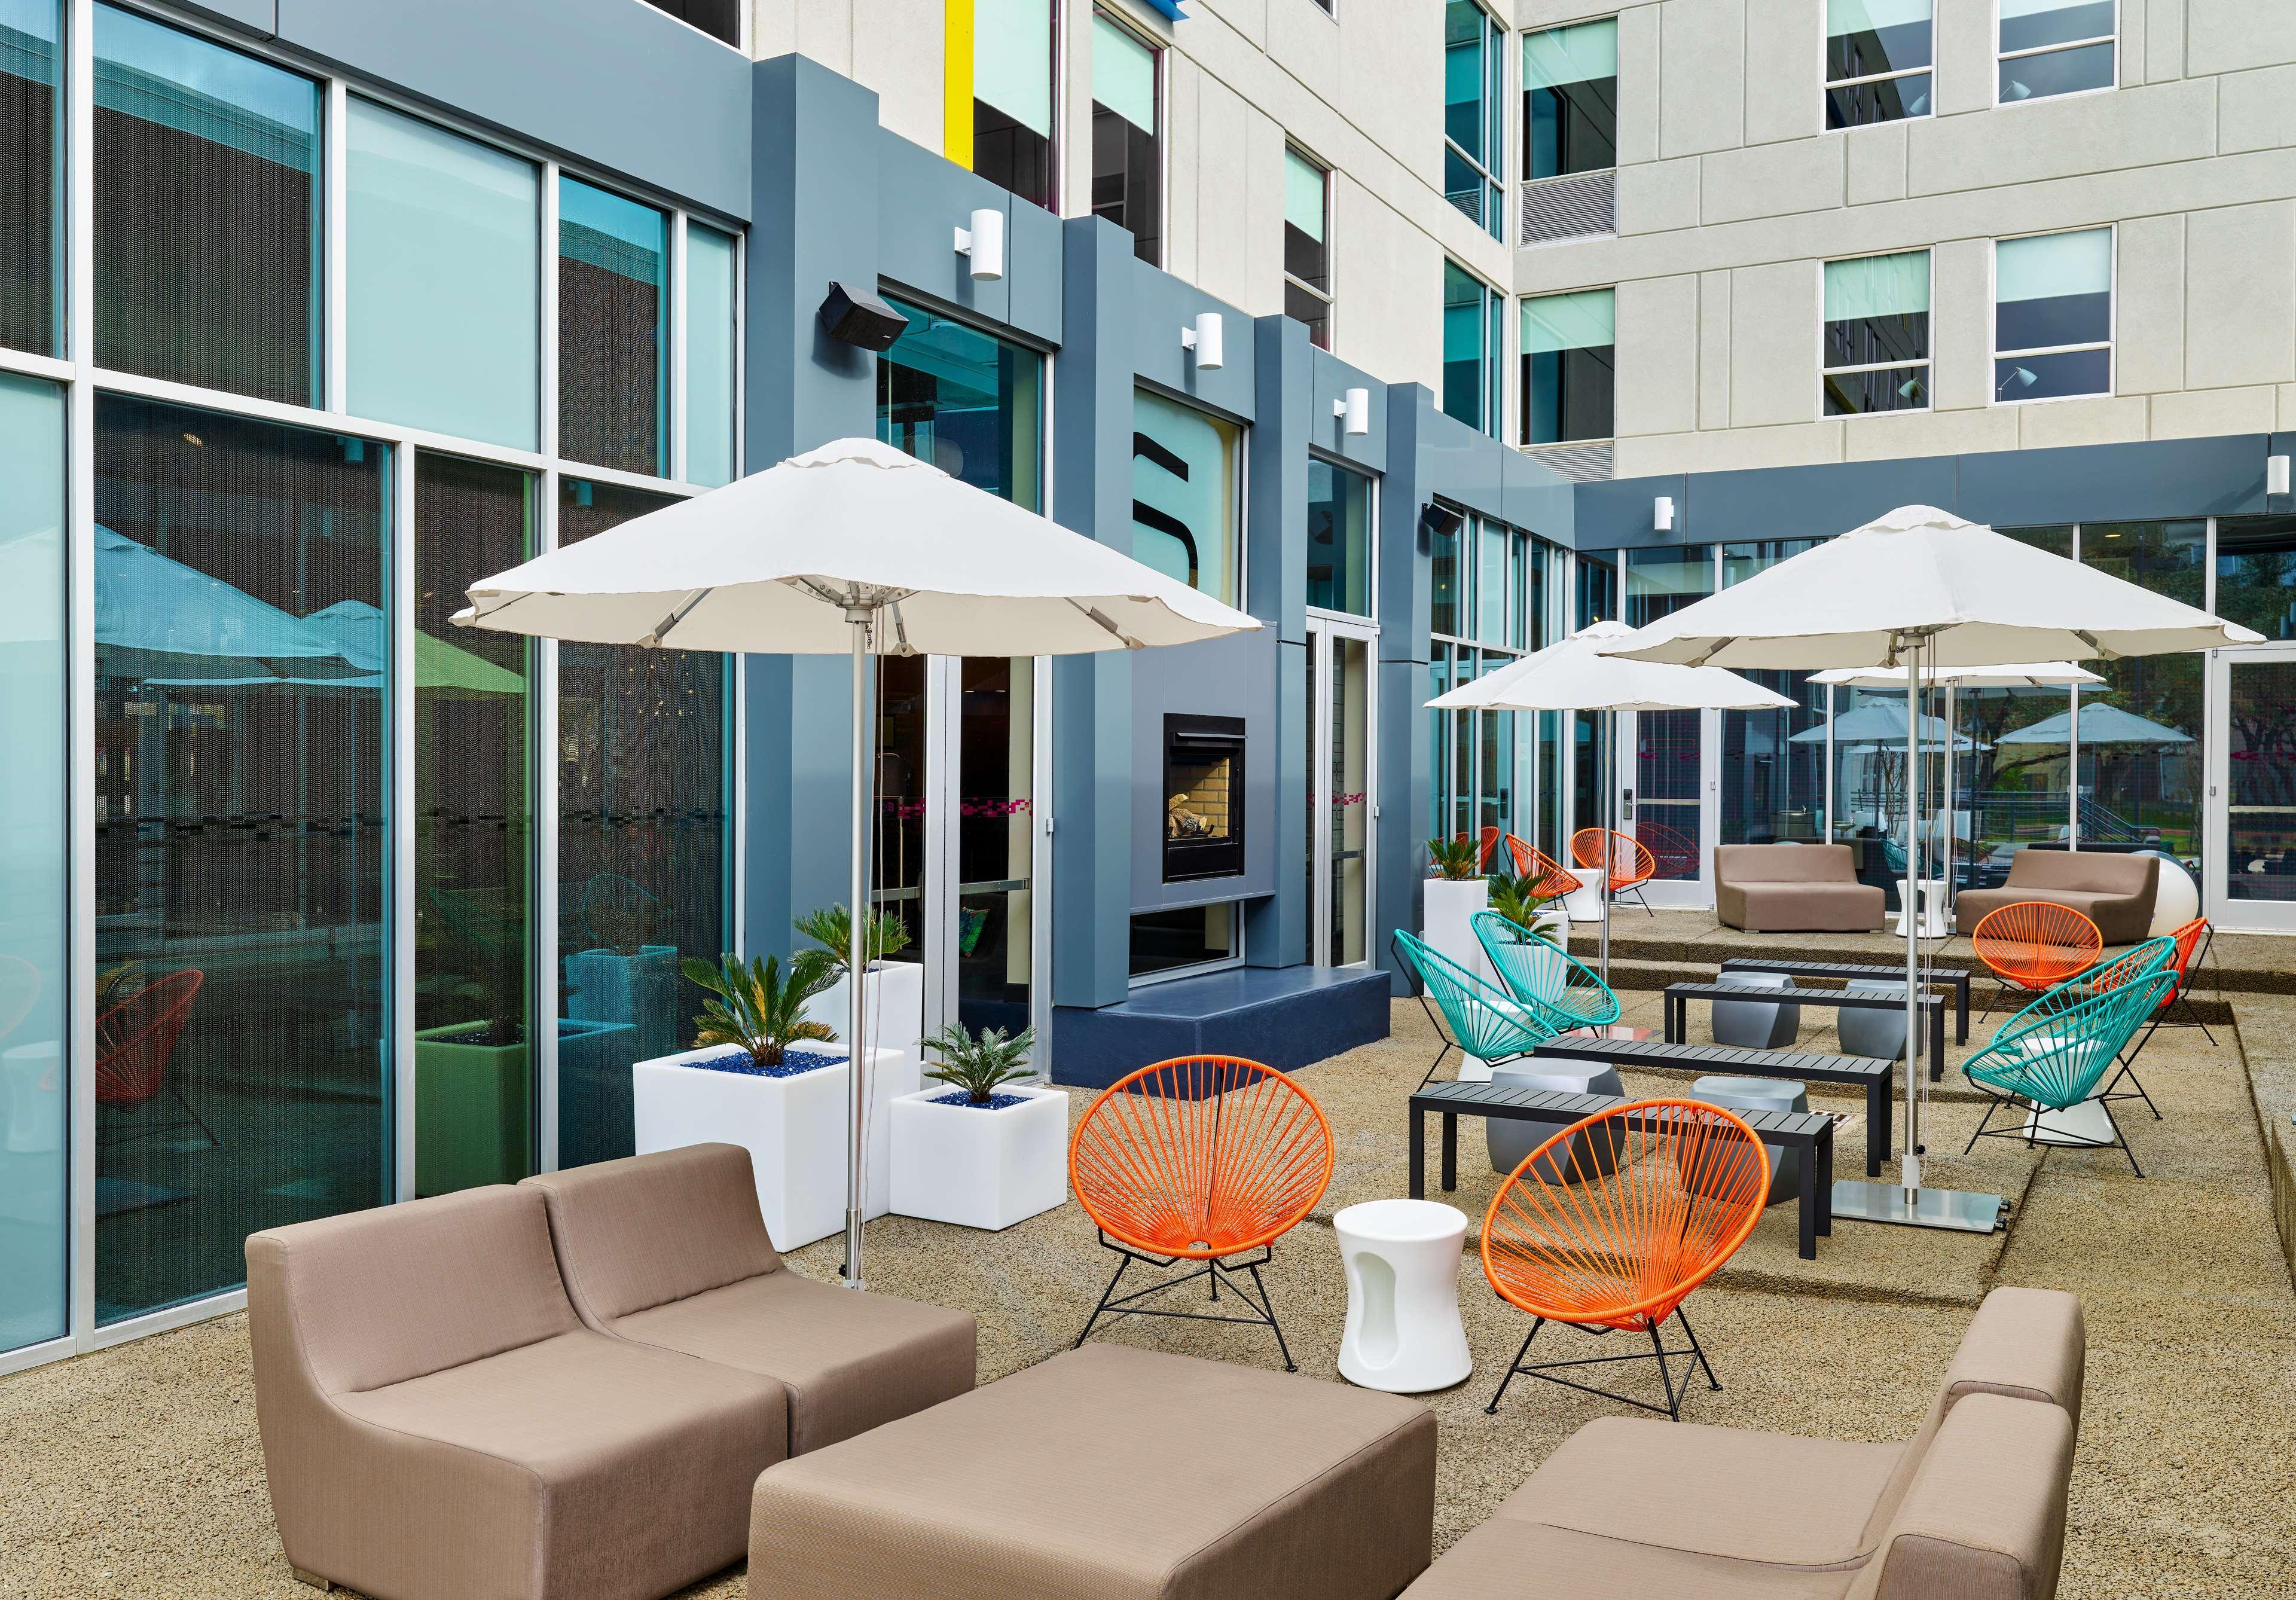 aloft austin northwest in austin tx 78717. Black Bedroom Furniture Sets. Home Design Ideas